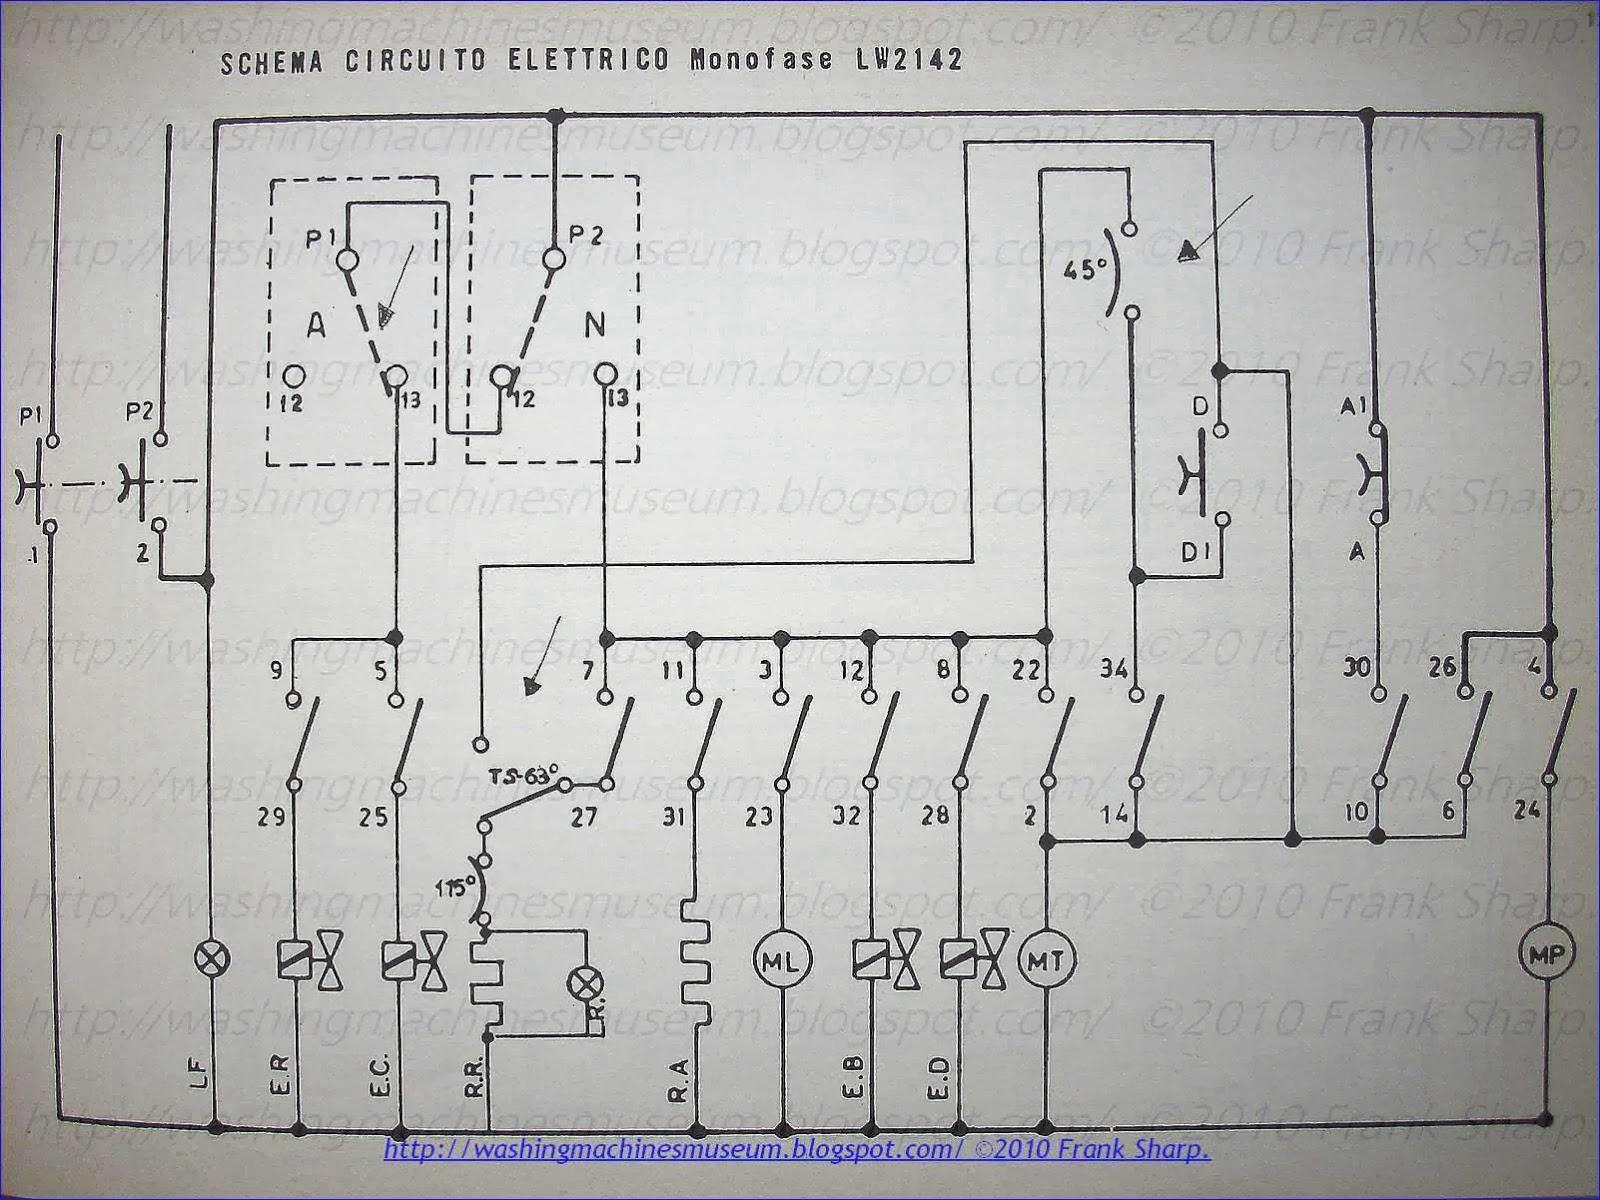 Washer Rama Museum   Philco Lw2142 - Lw2142  A  B Schematic Diagram